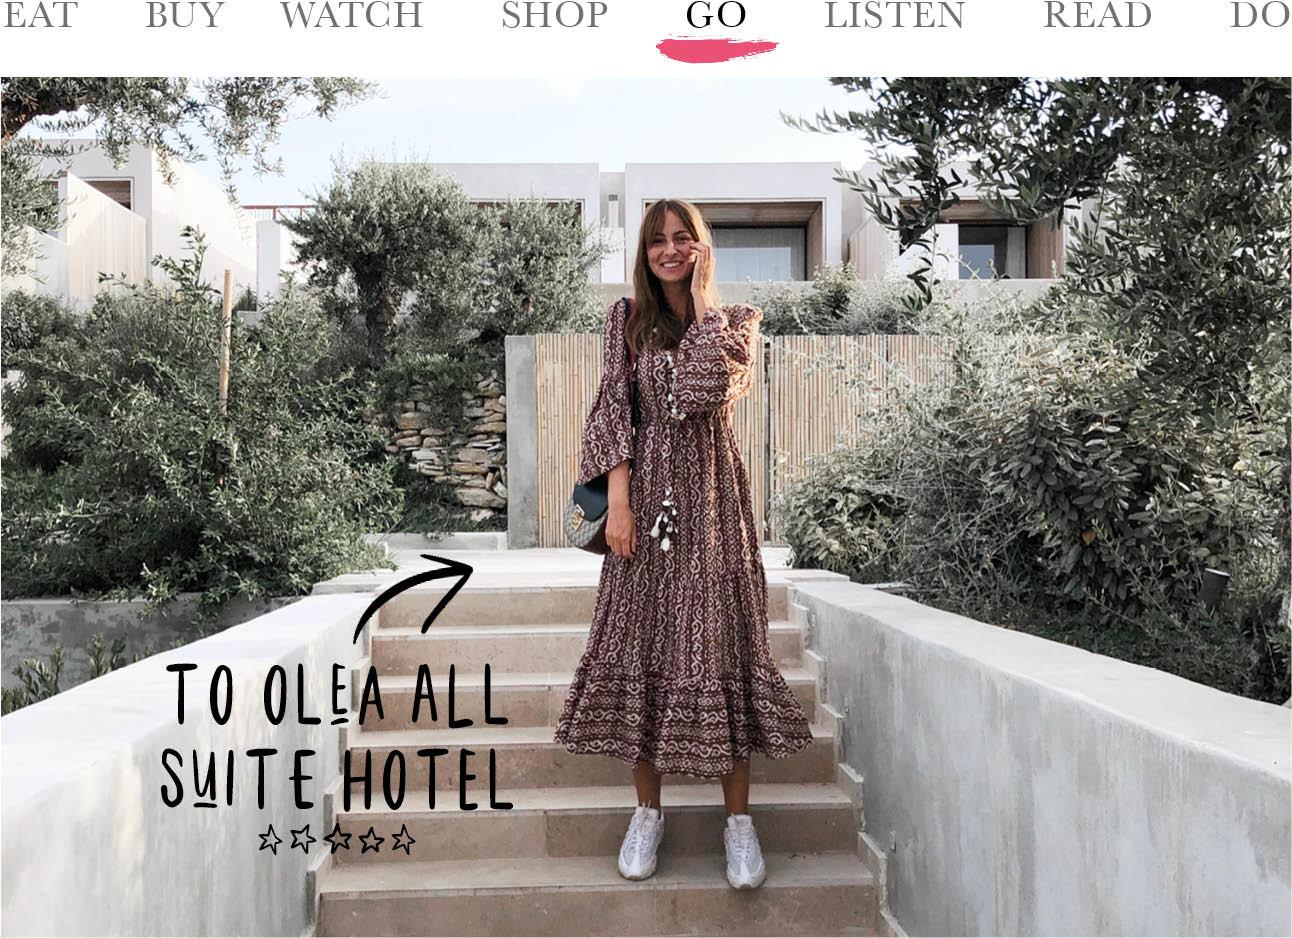 Today we go to Olea All Suite Hotel lilian brijl op de trap in een zomerse lange jurk